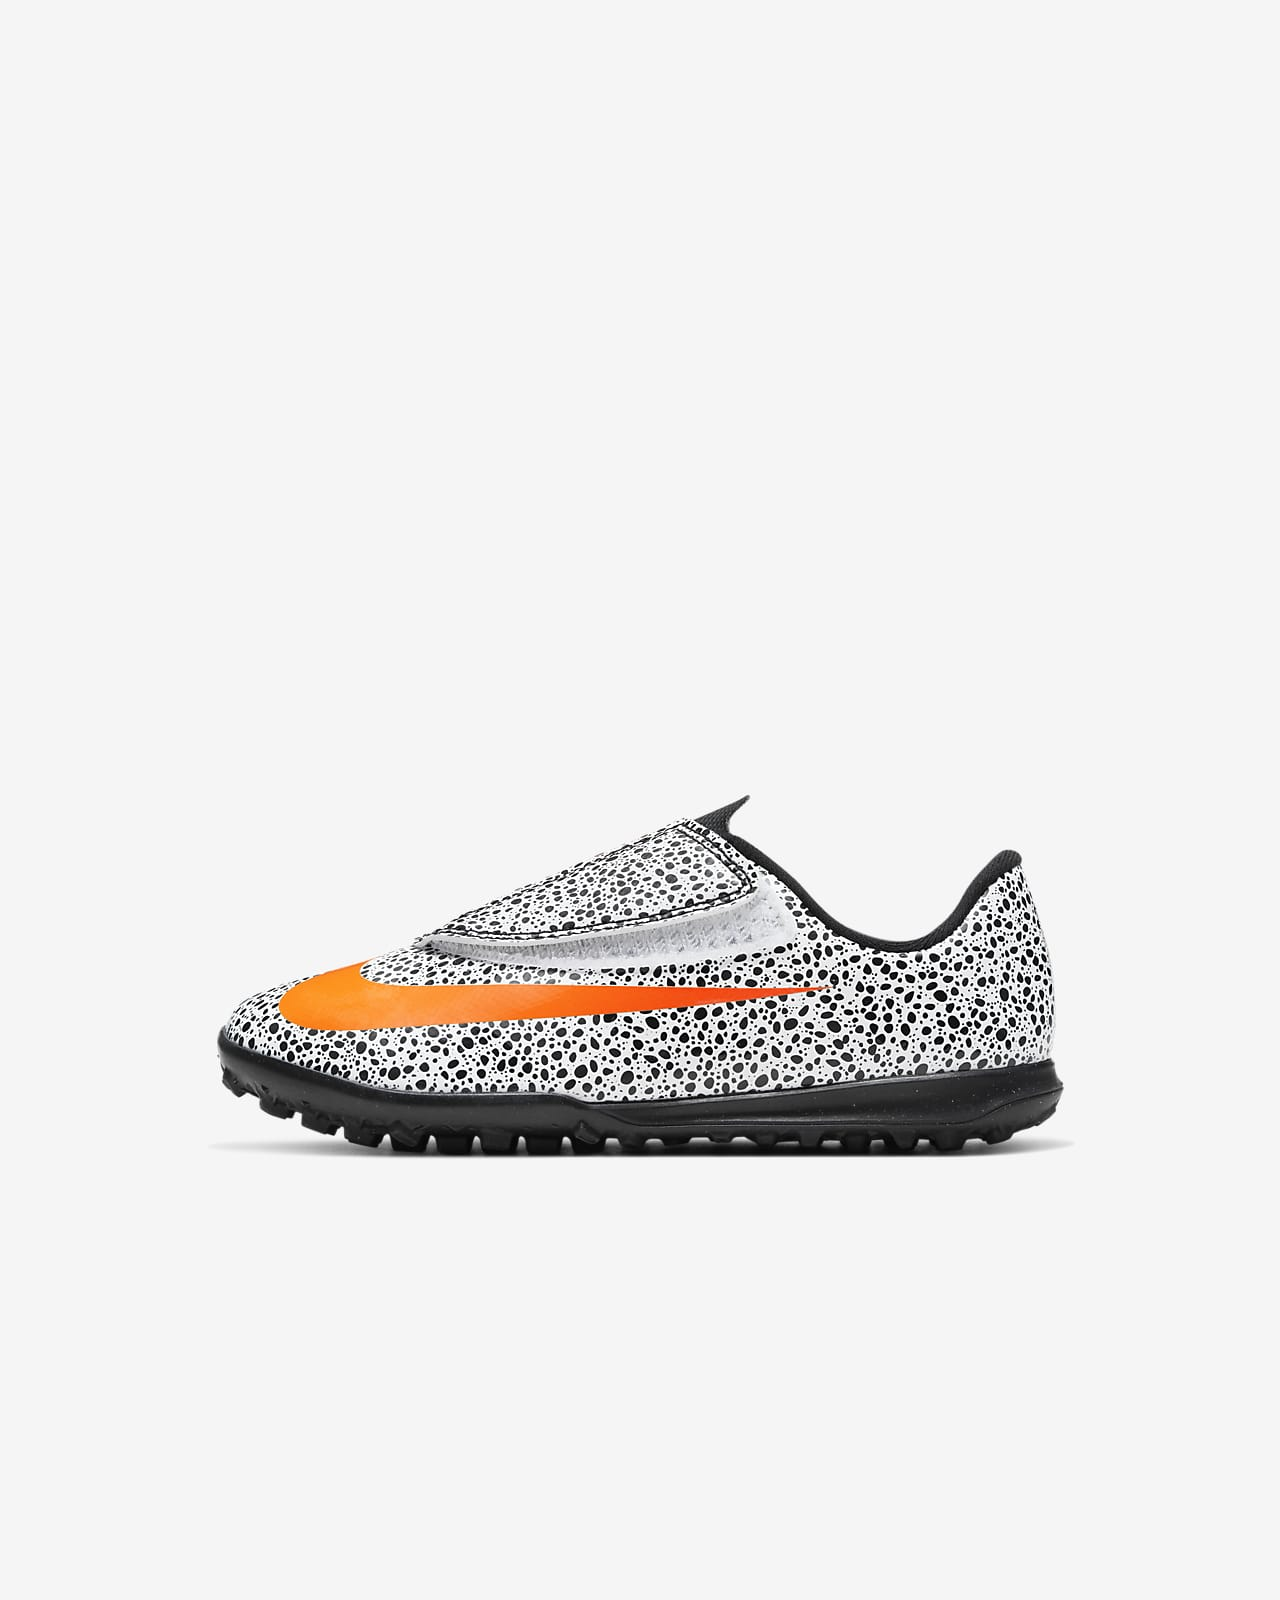 Nike Jr. Mercurial Vapor 13 Club CR7 Safari TF Toddler/Younger Kids' Artificial-Turf Football Shoe